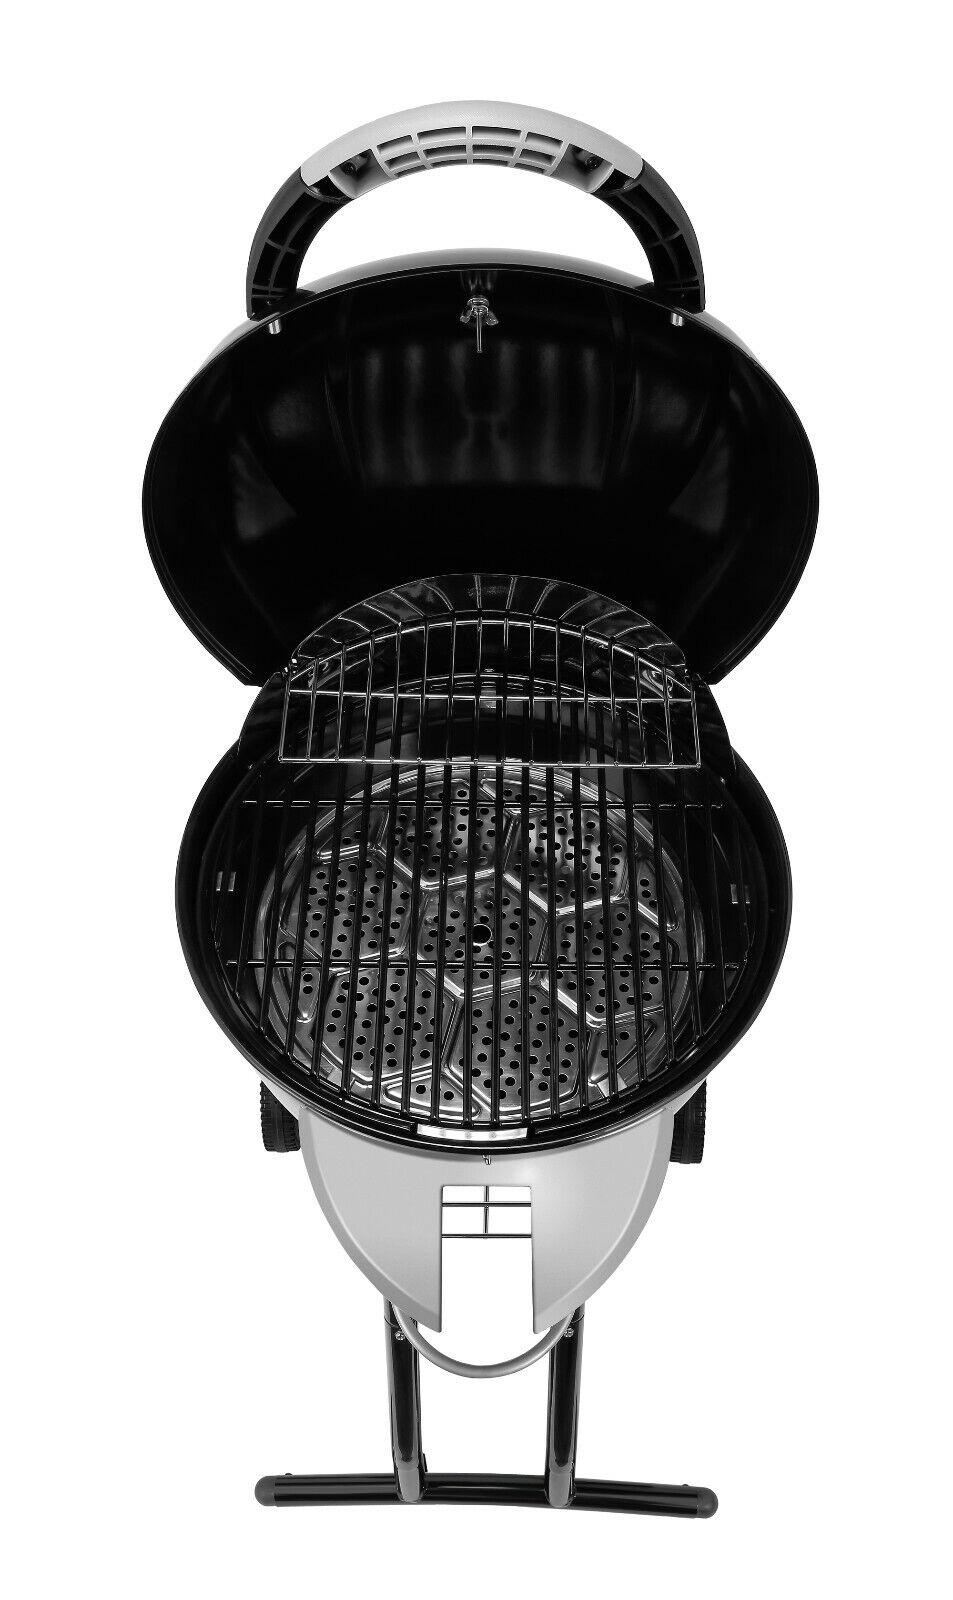 El Fuego AY 578  Elektrogrill Gardner, Grill Holzkohlegrill, Elektrogrill